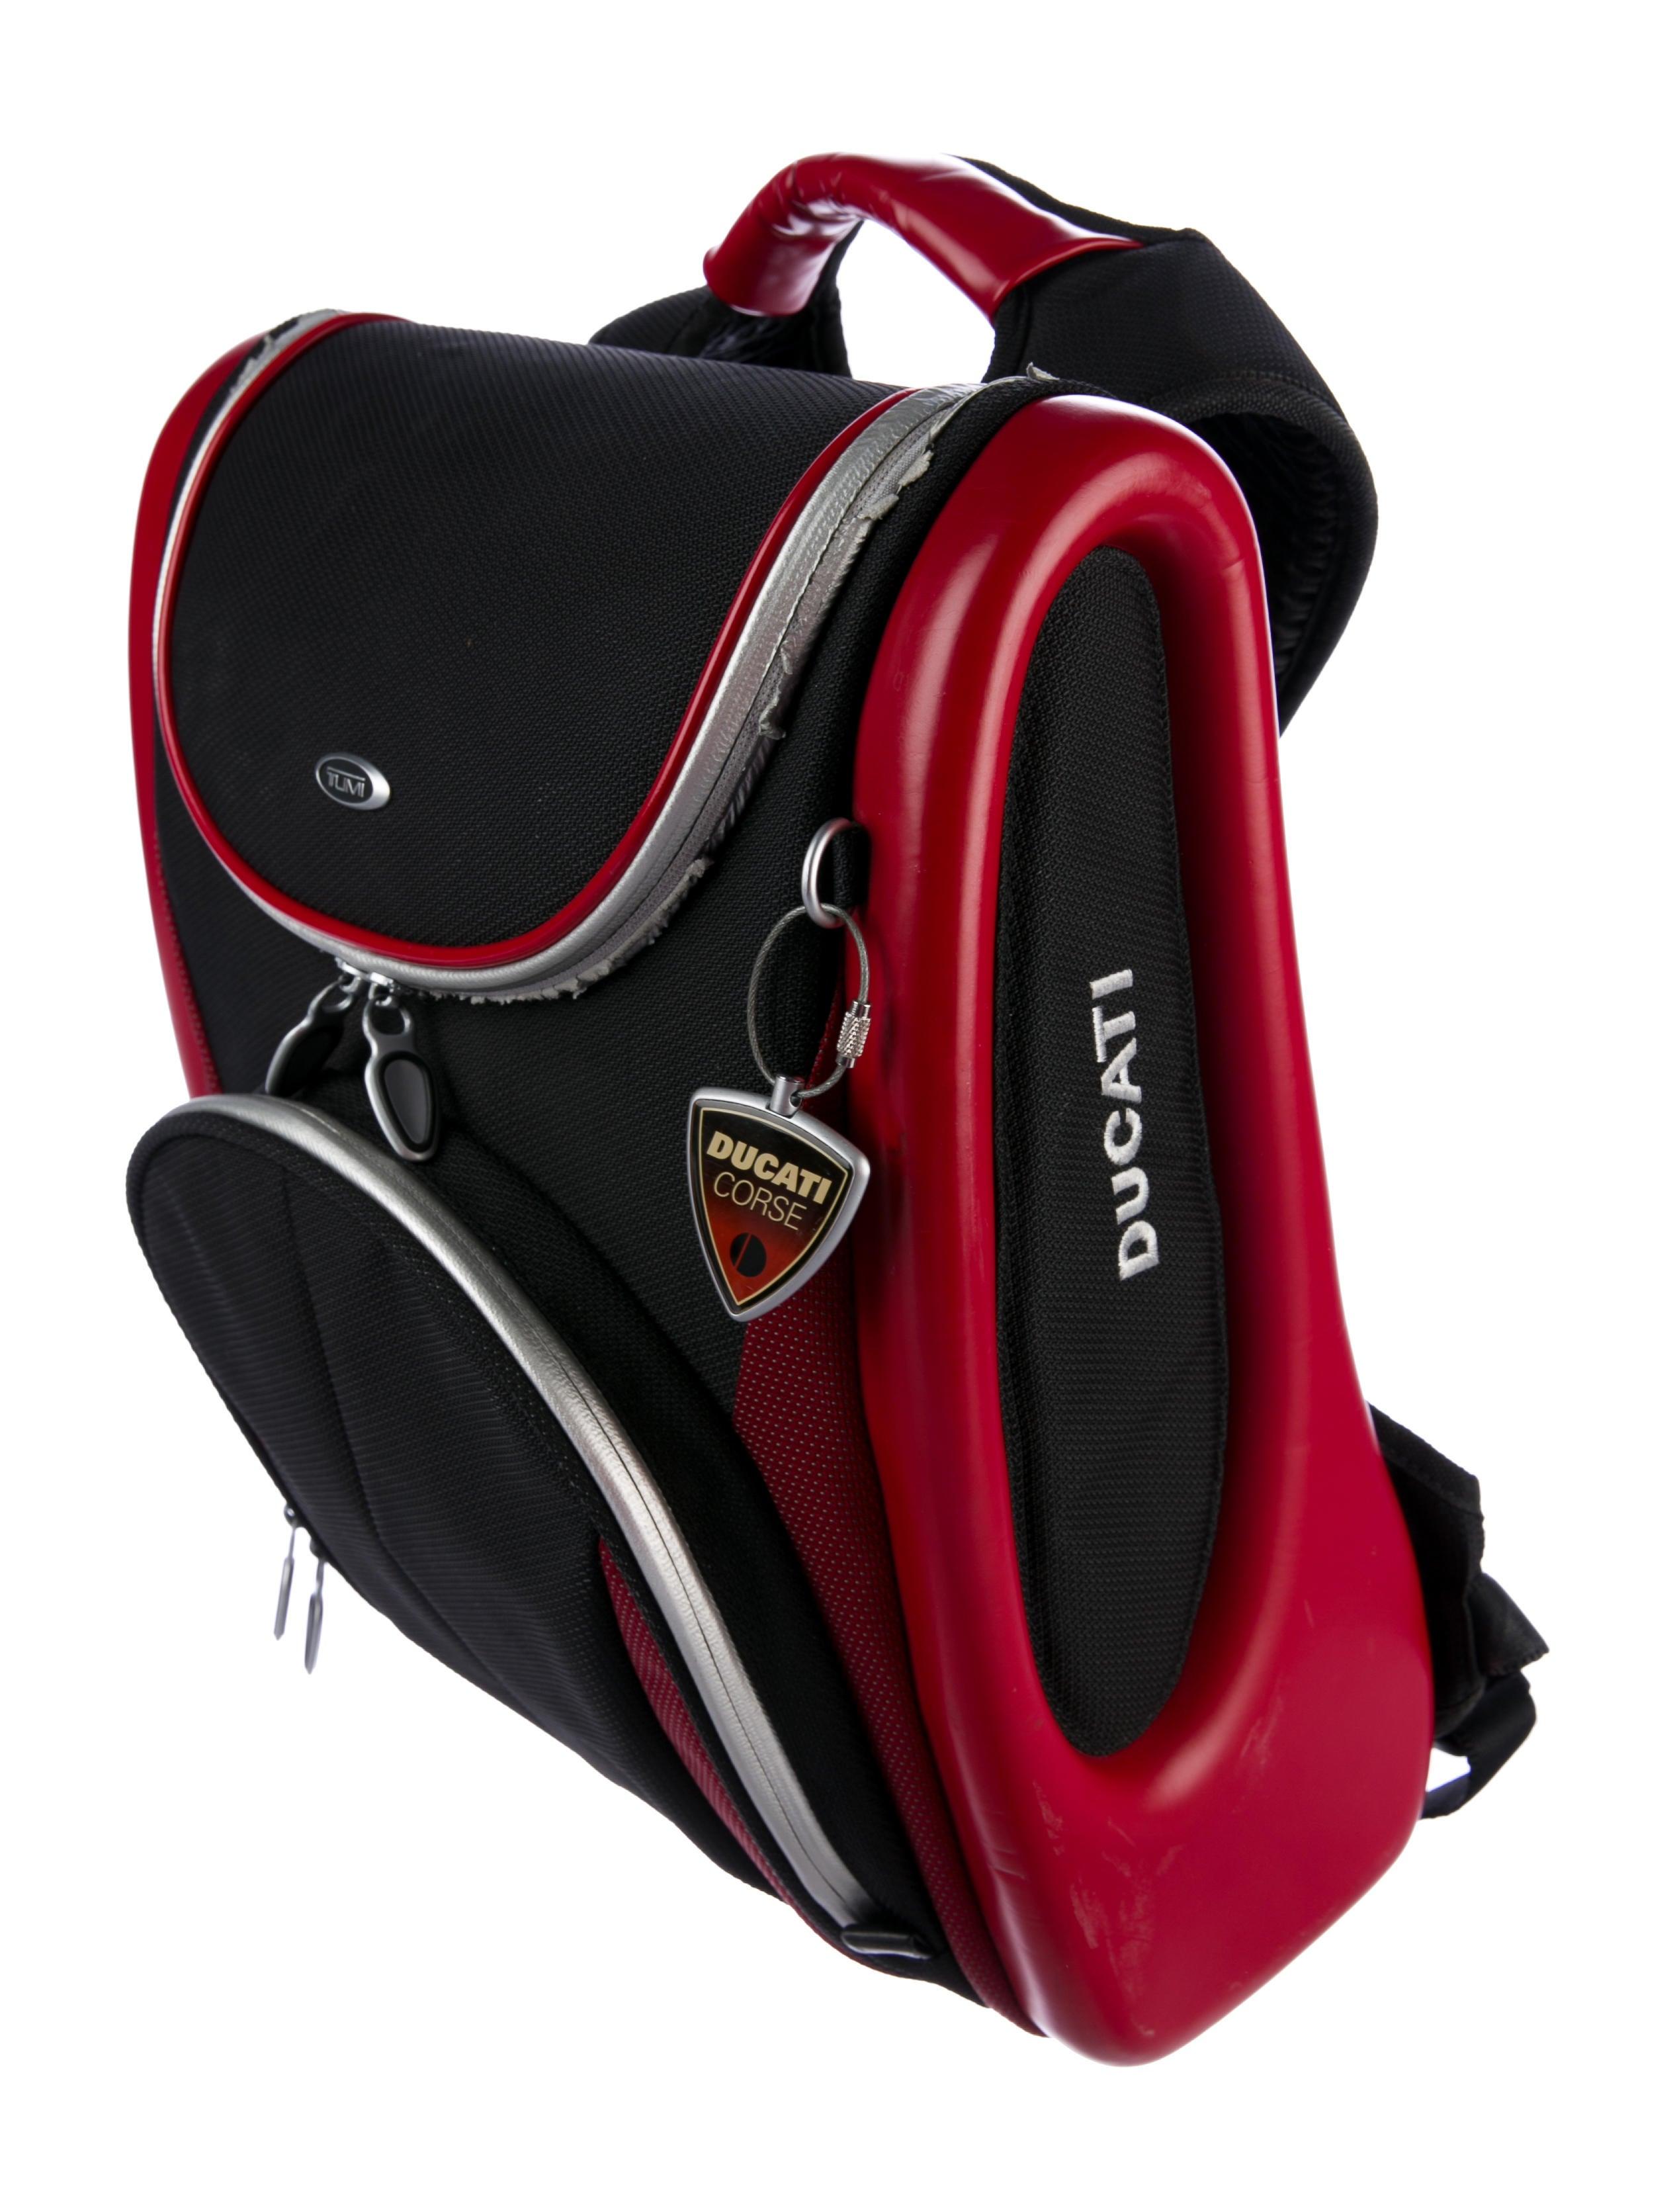 Tumi T3 Ducati Backpack - Bags - TMI21732 | The RealReal